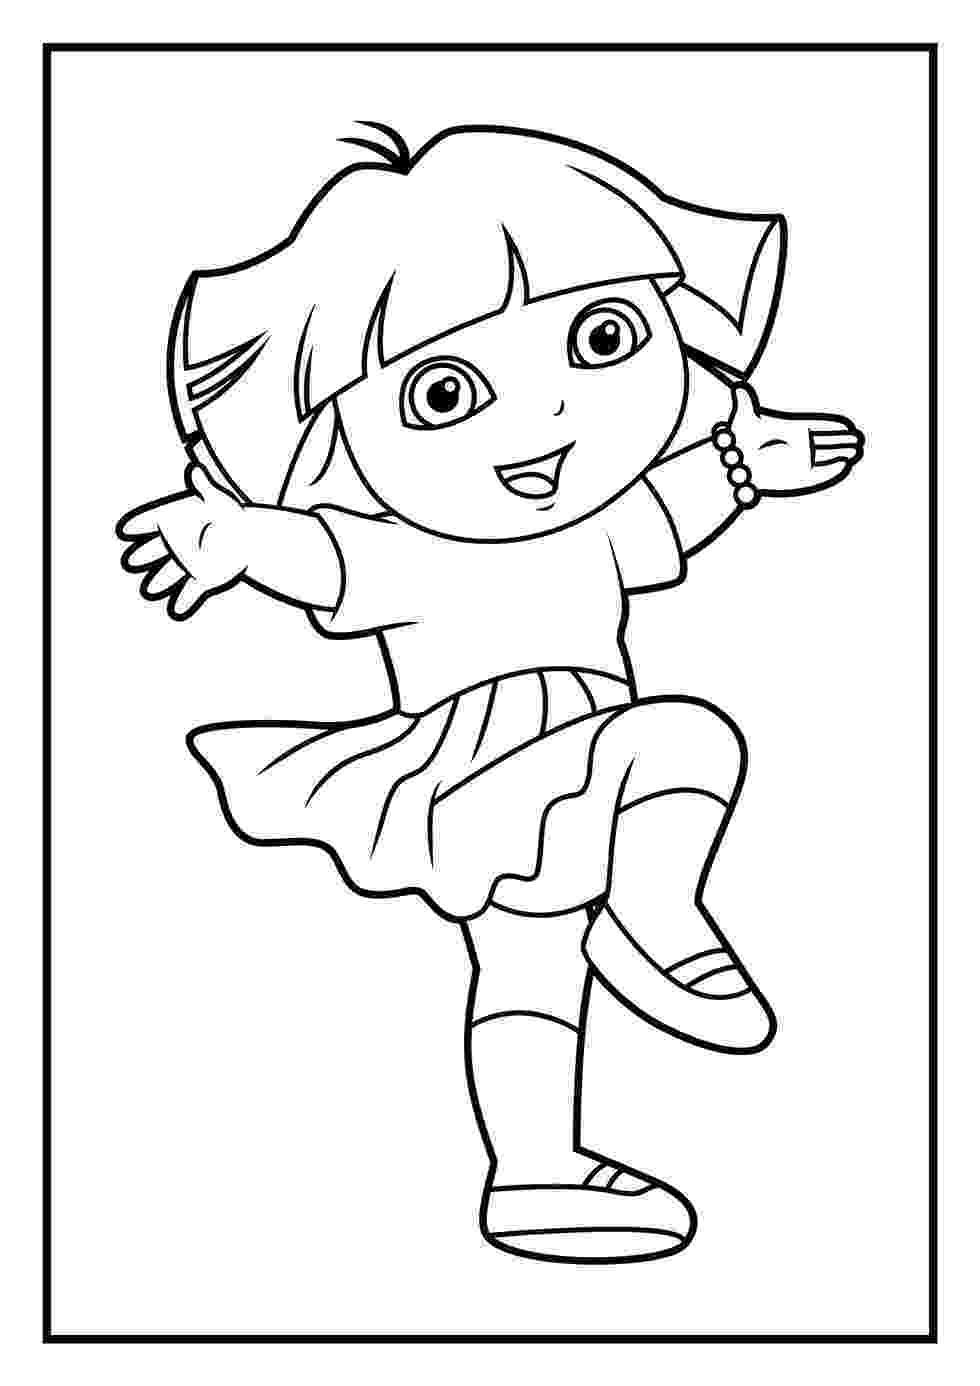 dora color free printable dora coloring pages for kids cool2bkids dora color